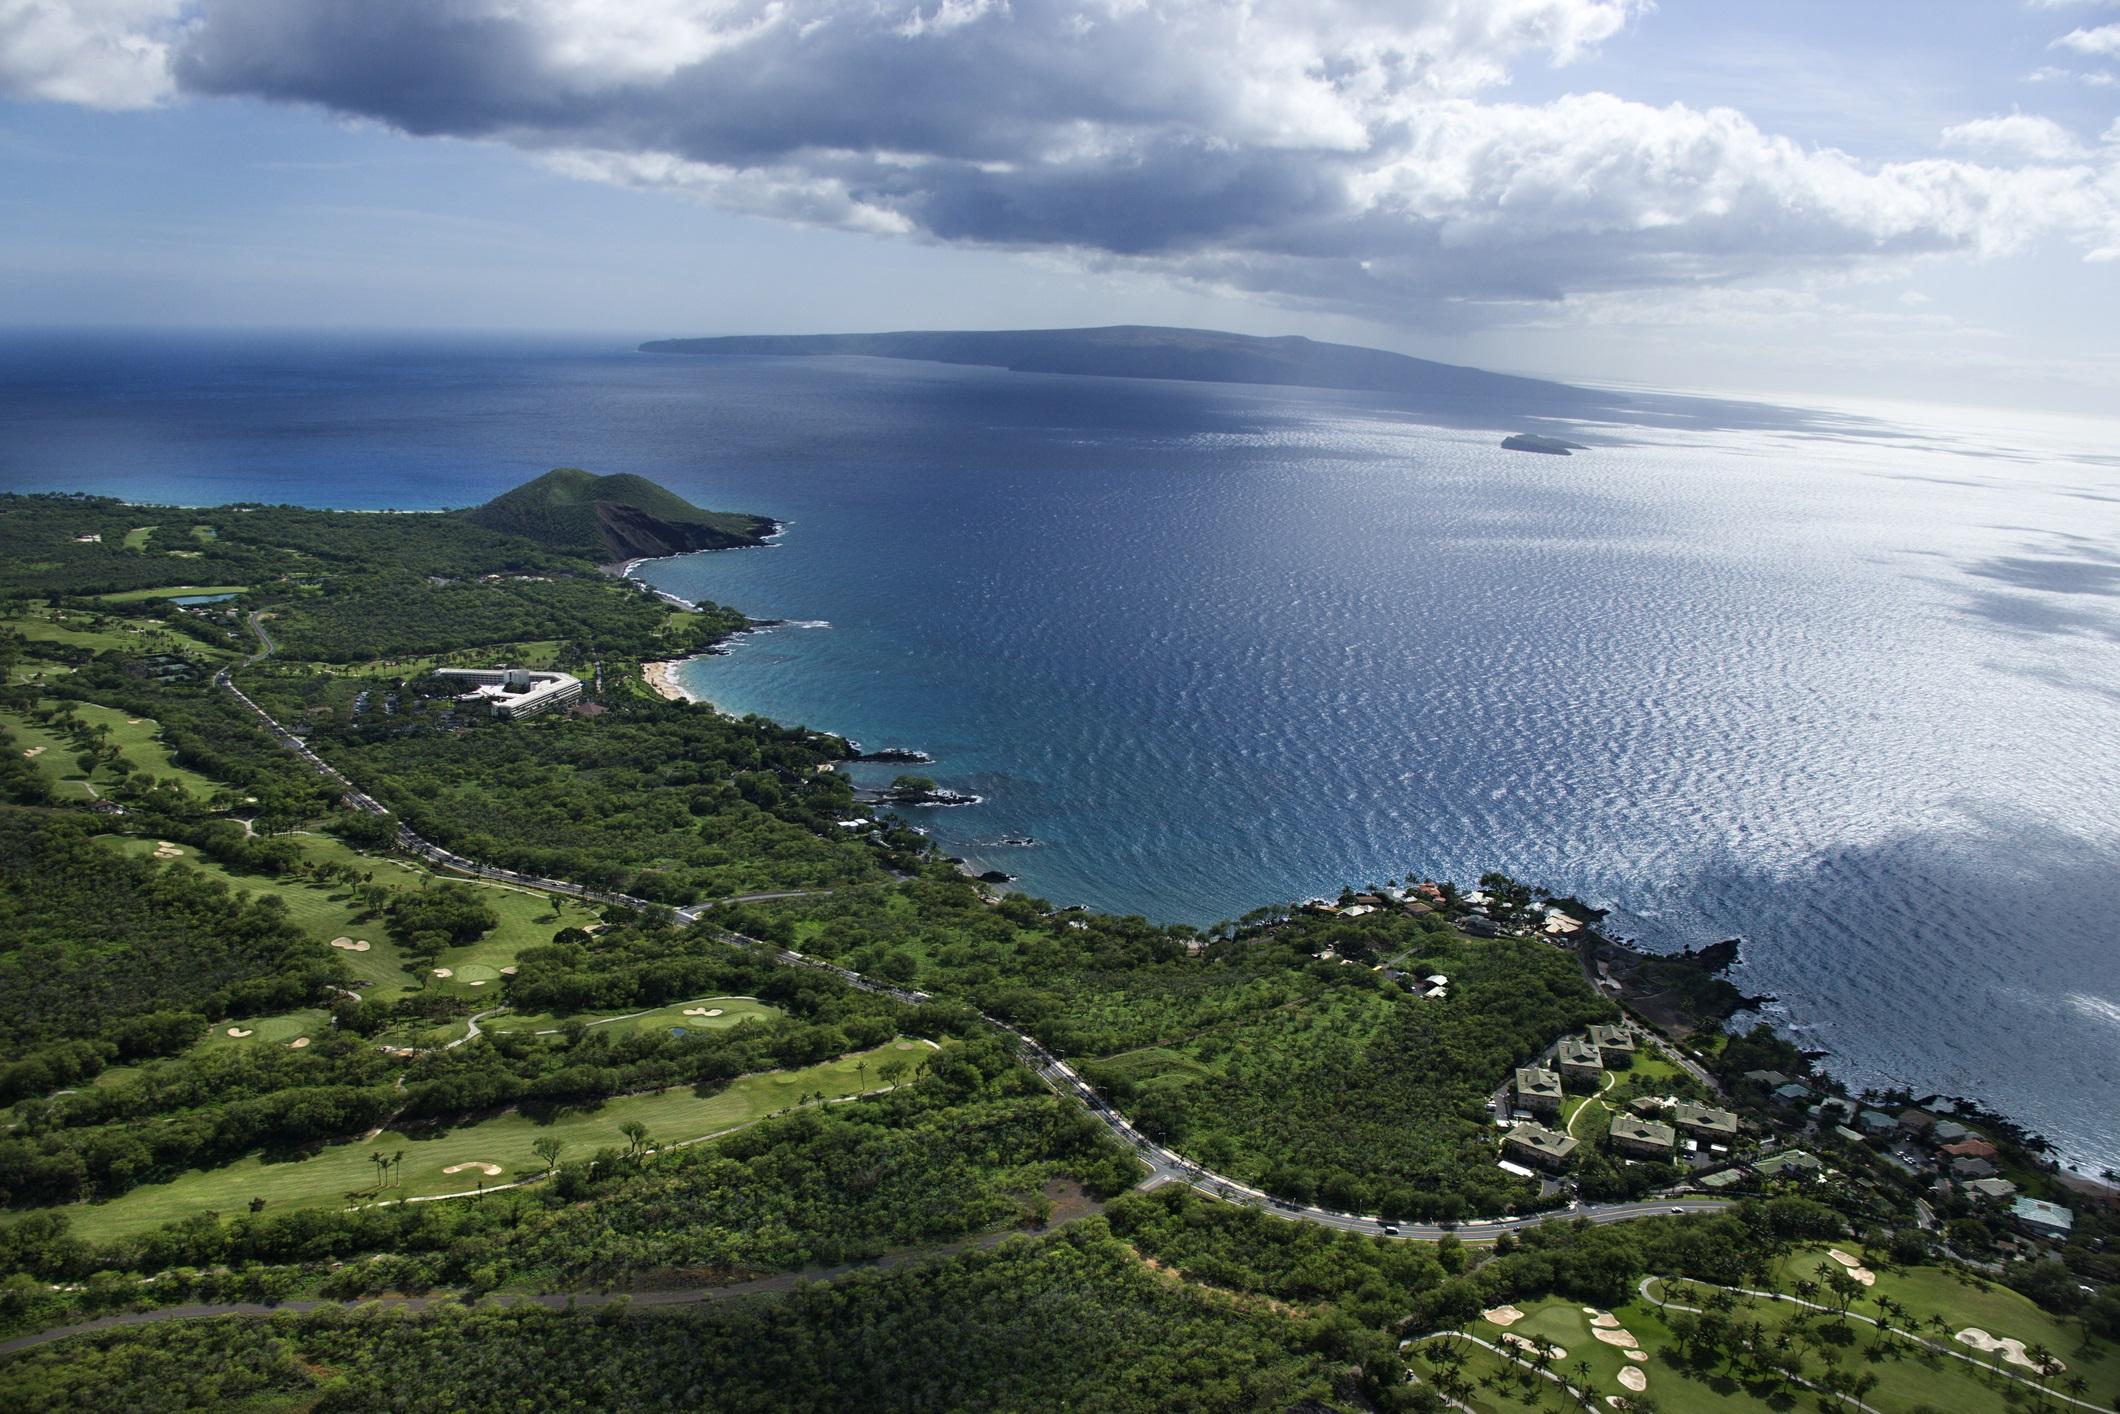 Maui Real Estate Report 2014